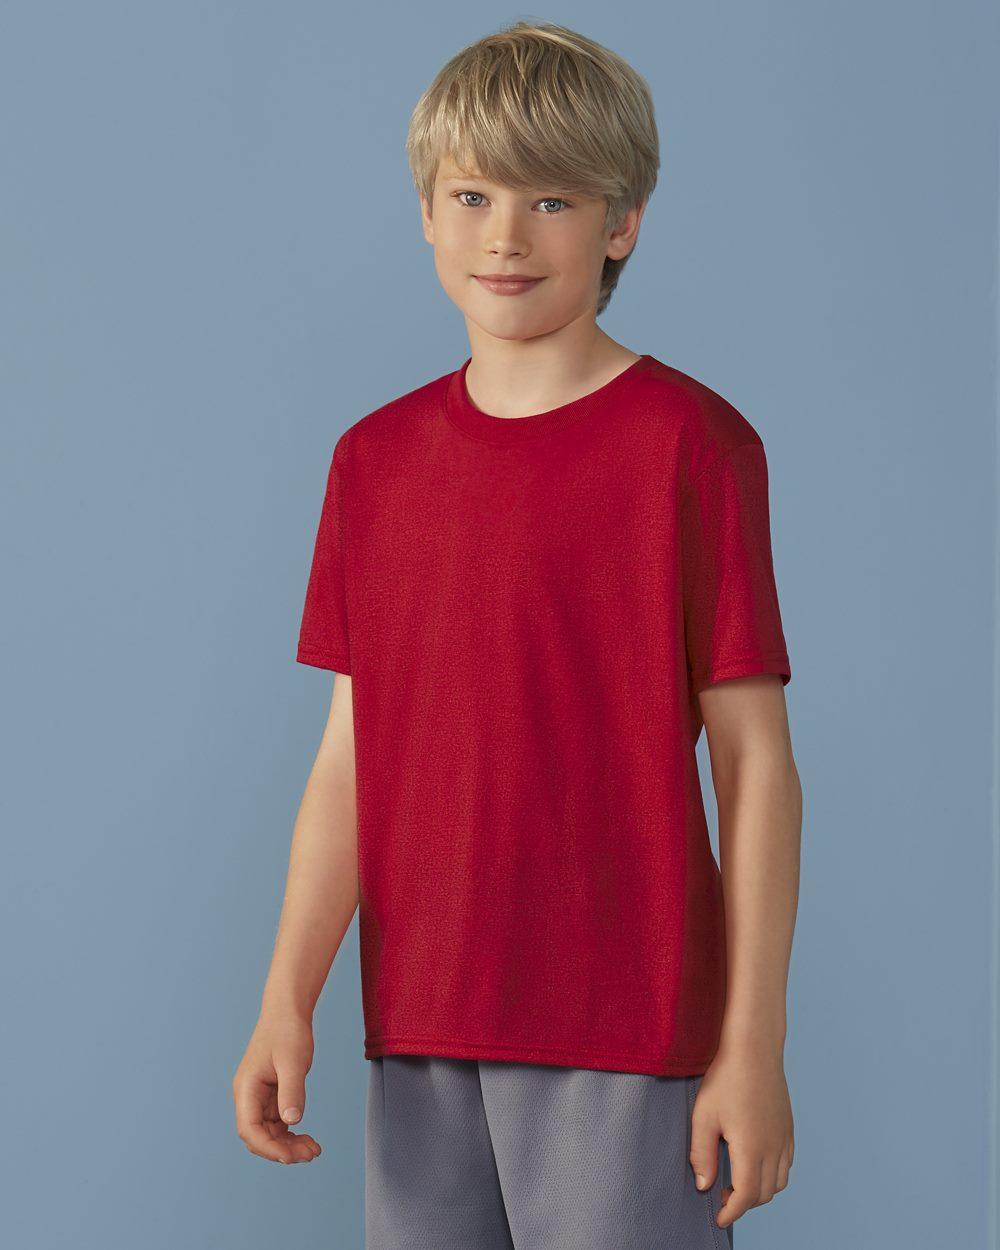 Gildan 46000B - Performance Youth Short Sleeve T-Shirt